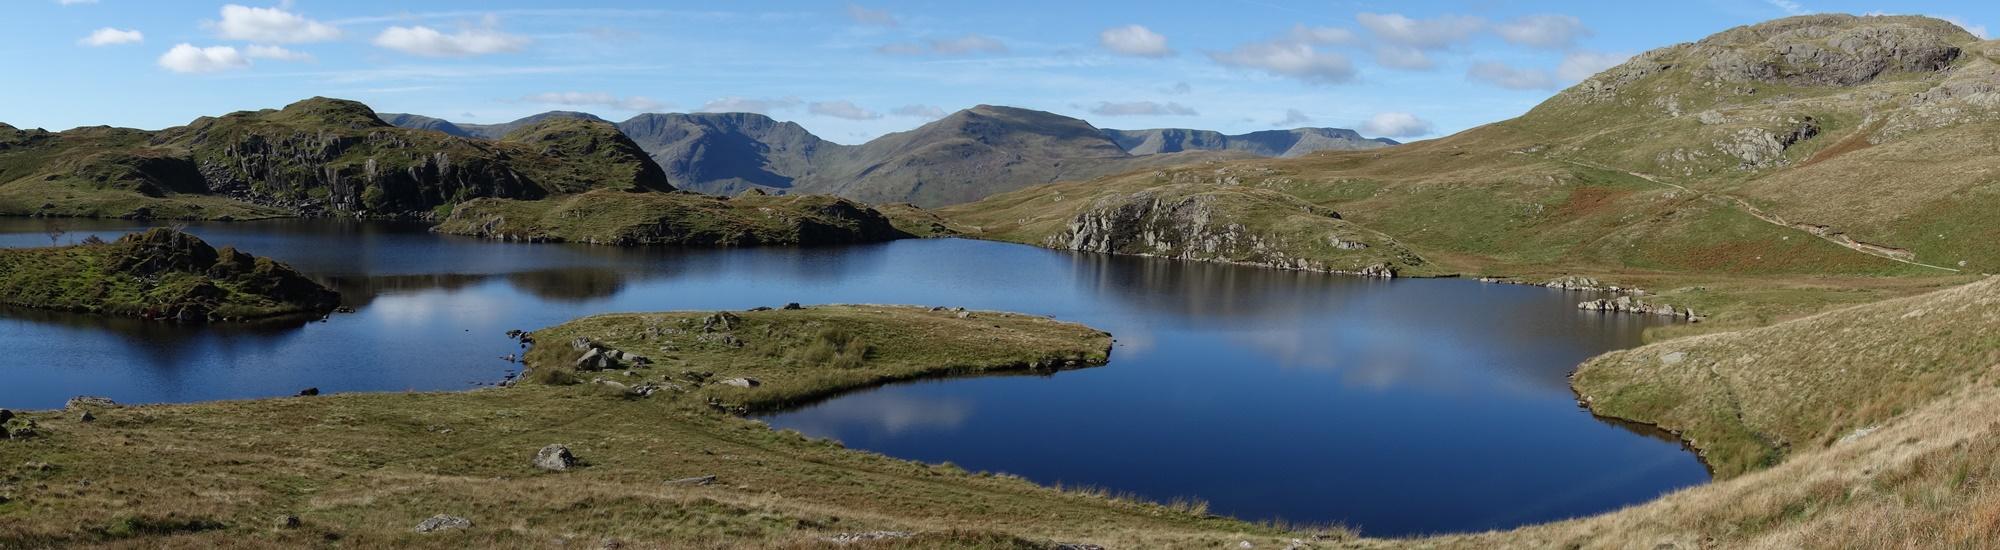 Panoramic photo of a lake on The Coast to Coast West